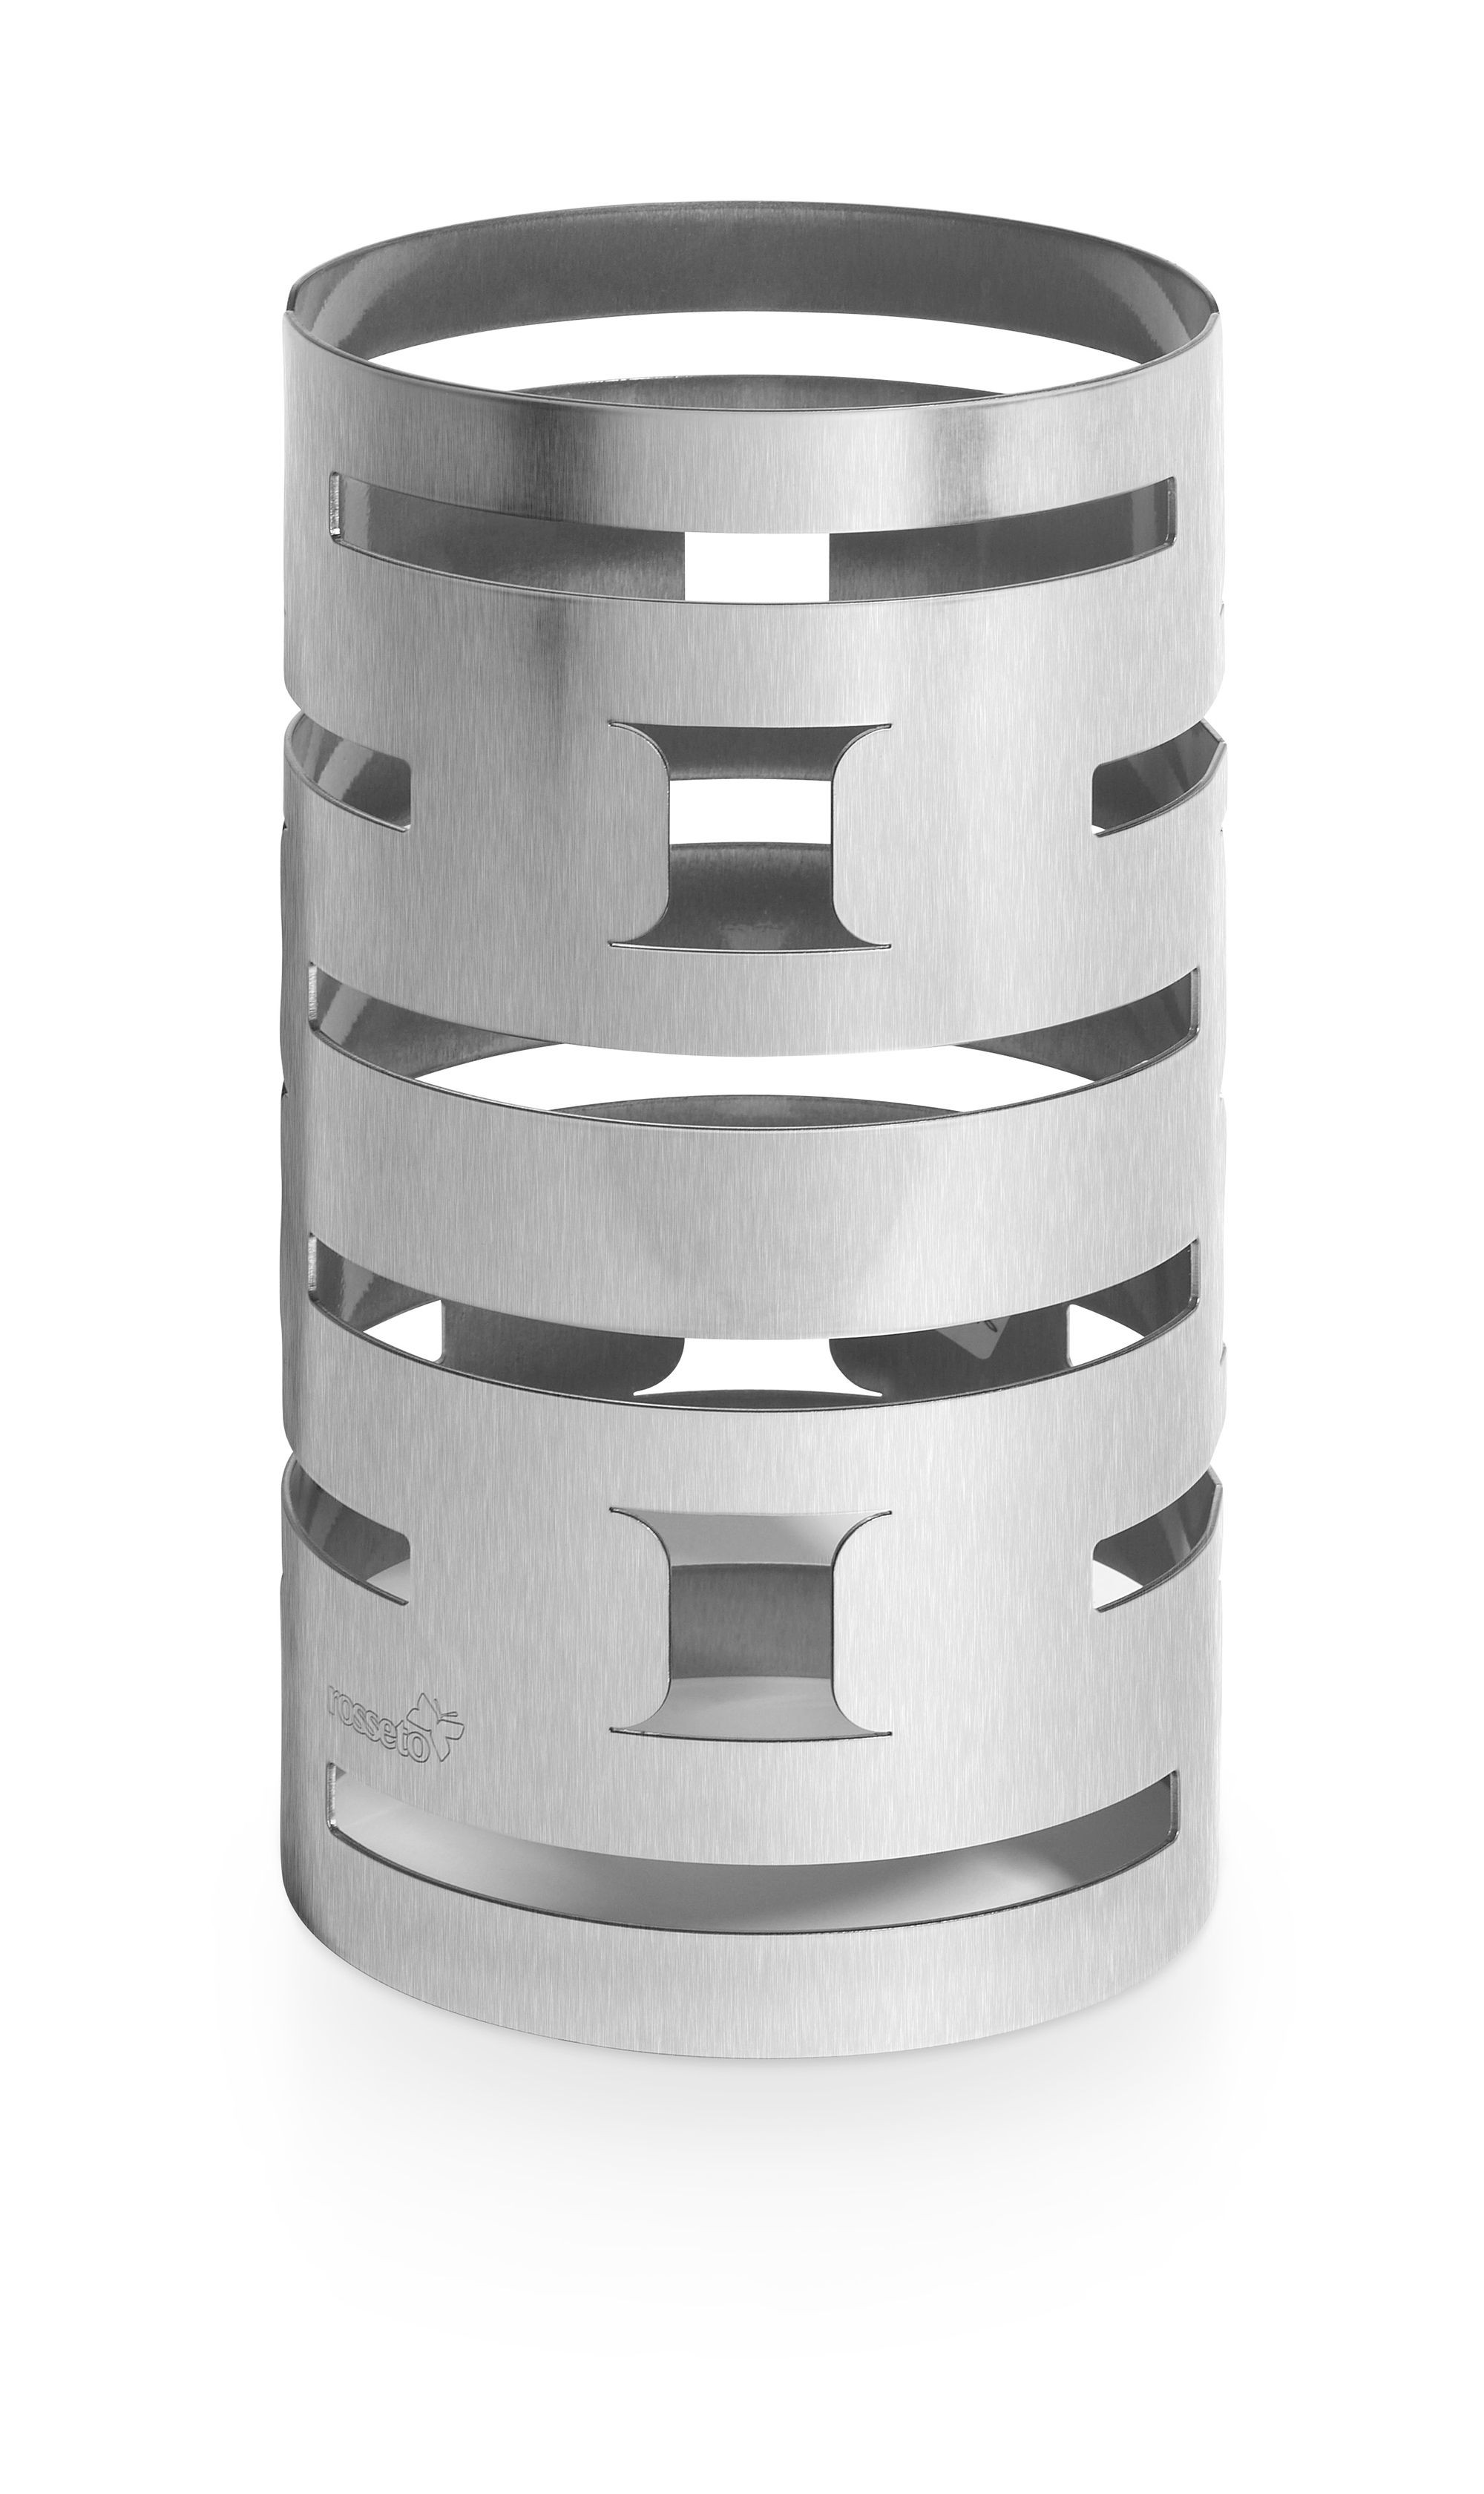 "Rosseto SM184 Skycap Stainless Steel Round Multi-Level Rise- 6.38"" x 6.38"" x 12""H"